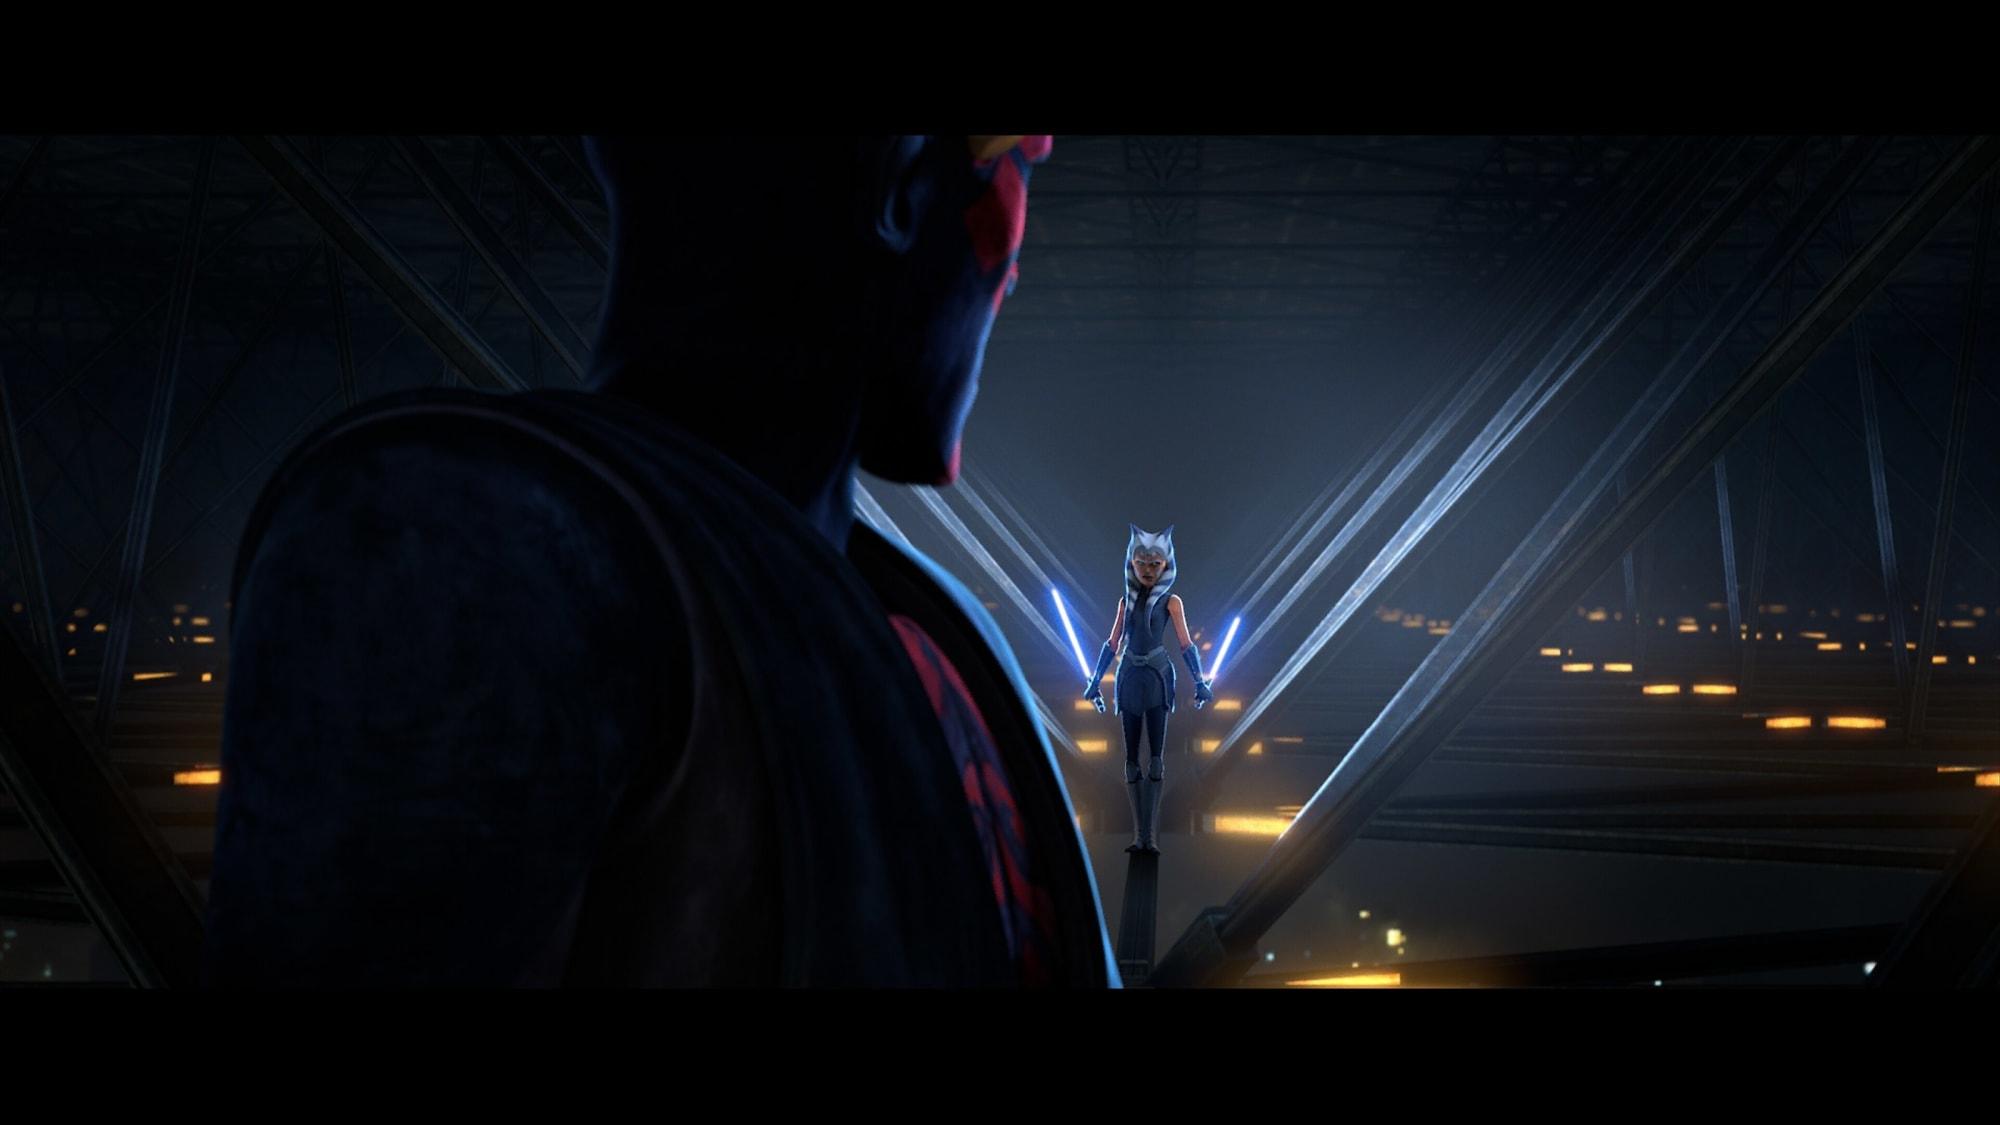 Star Wars: Raising Malevolence shows Ahsoka's foundation